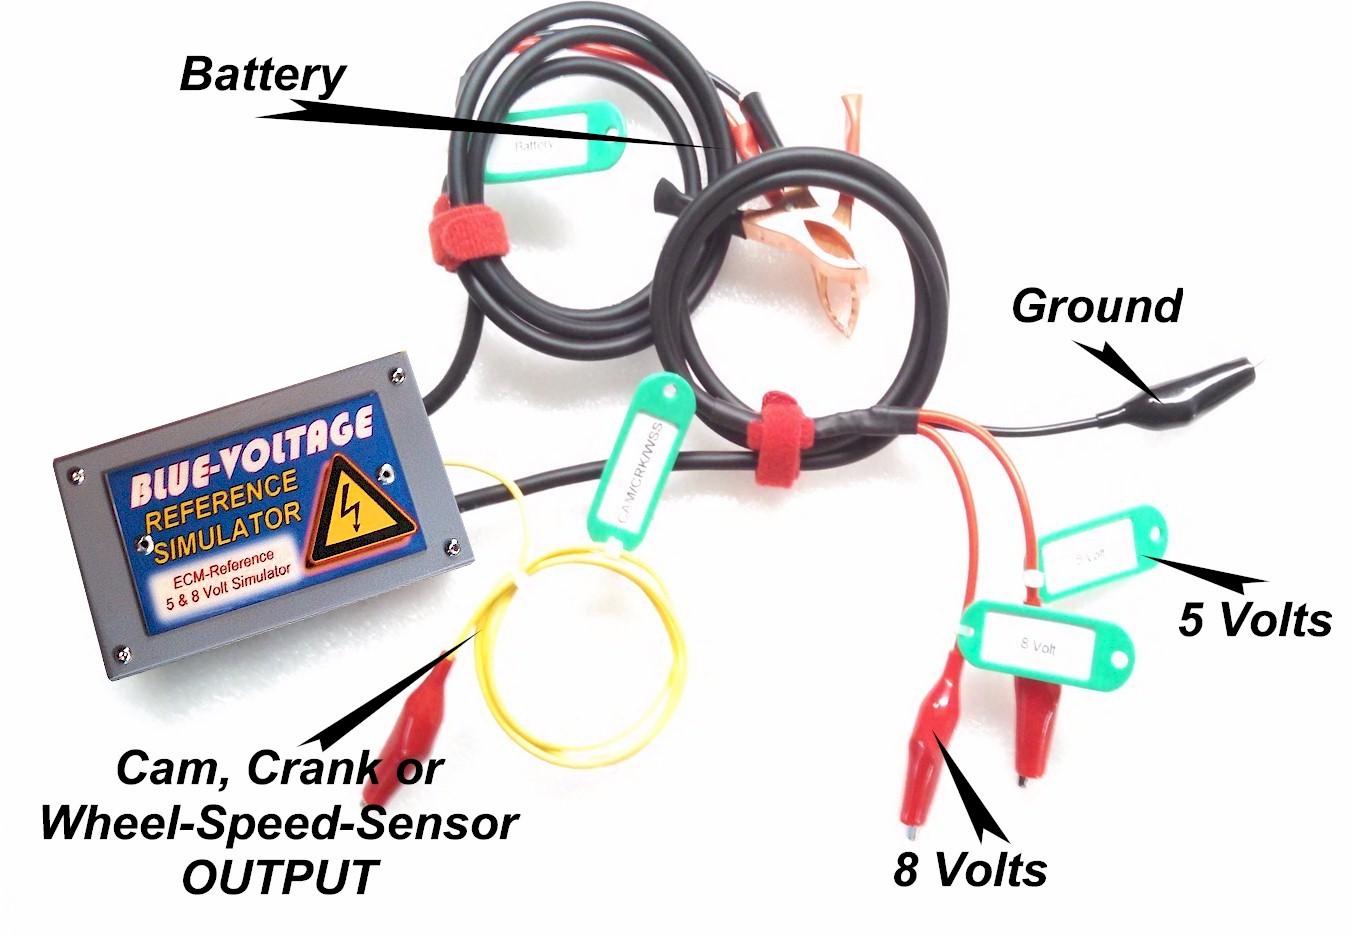 ecm reference voltage speed sensor simulator